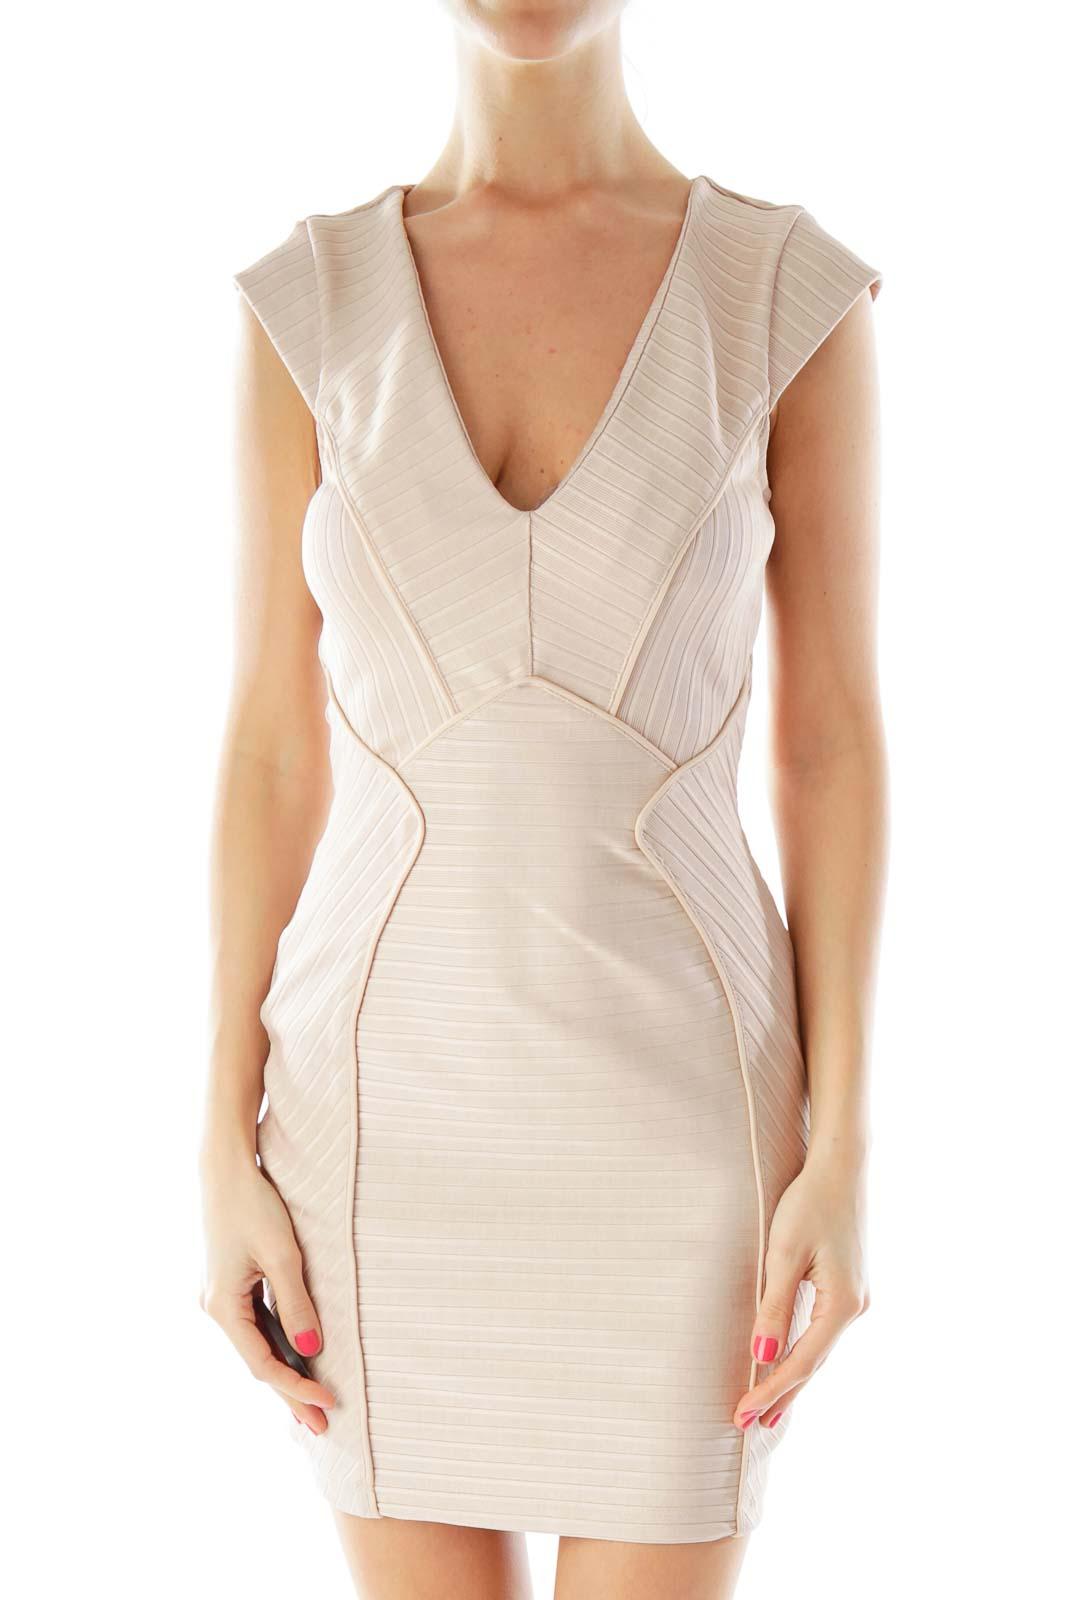 Champagne V-Neck Bodycon Dress